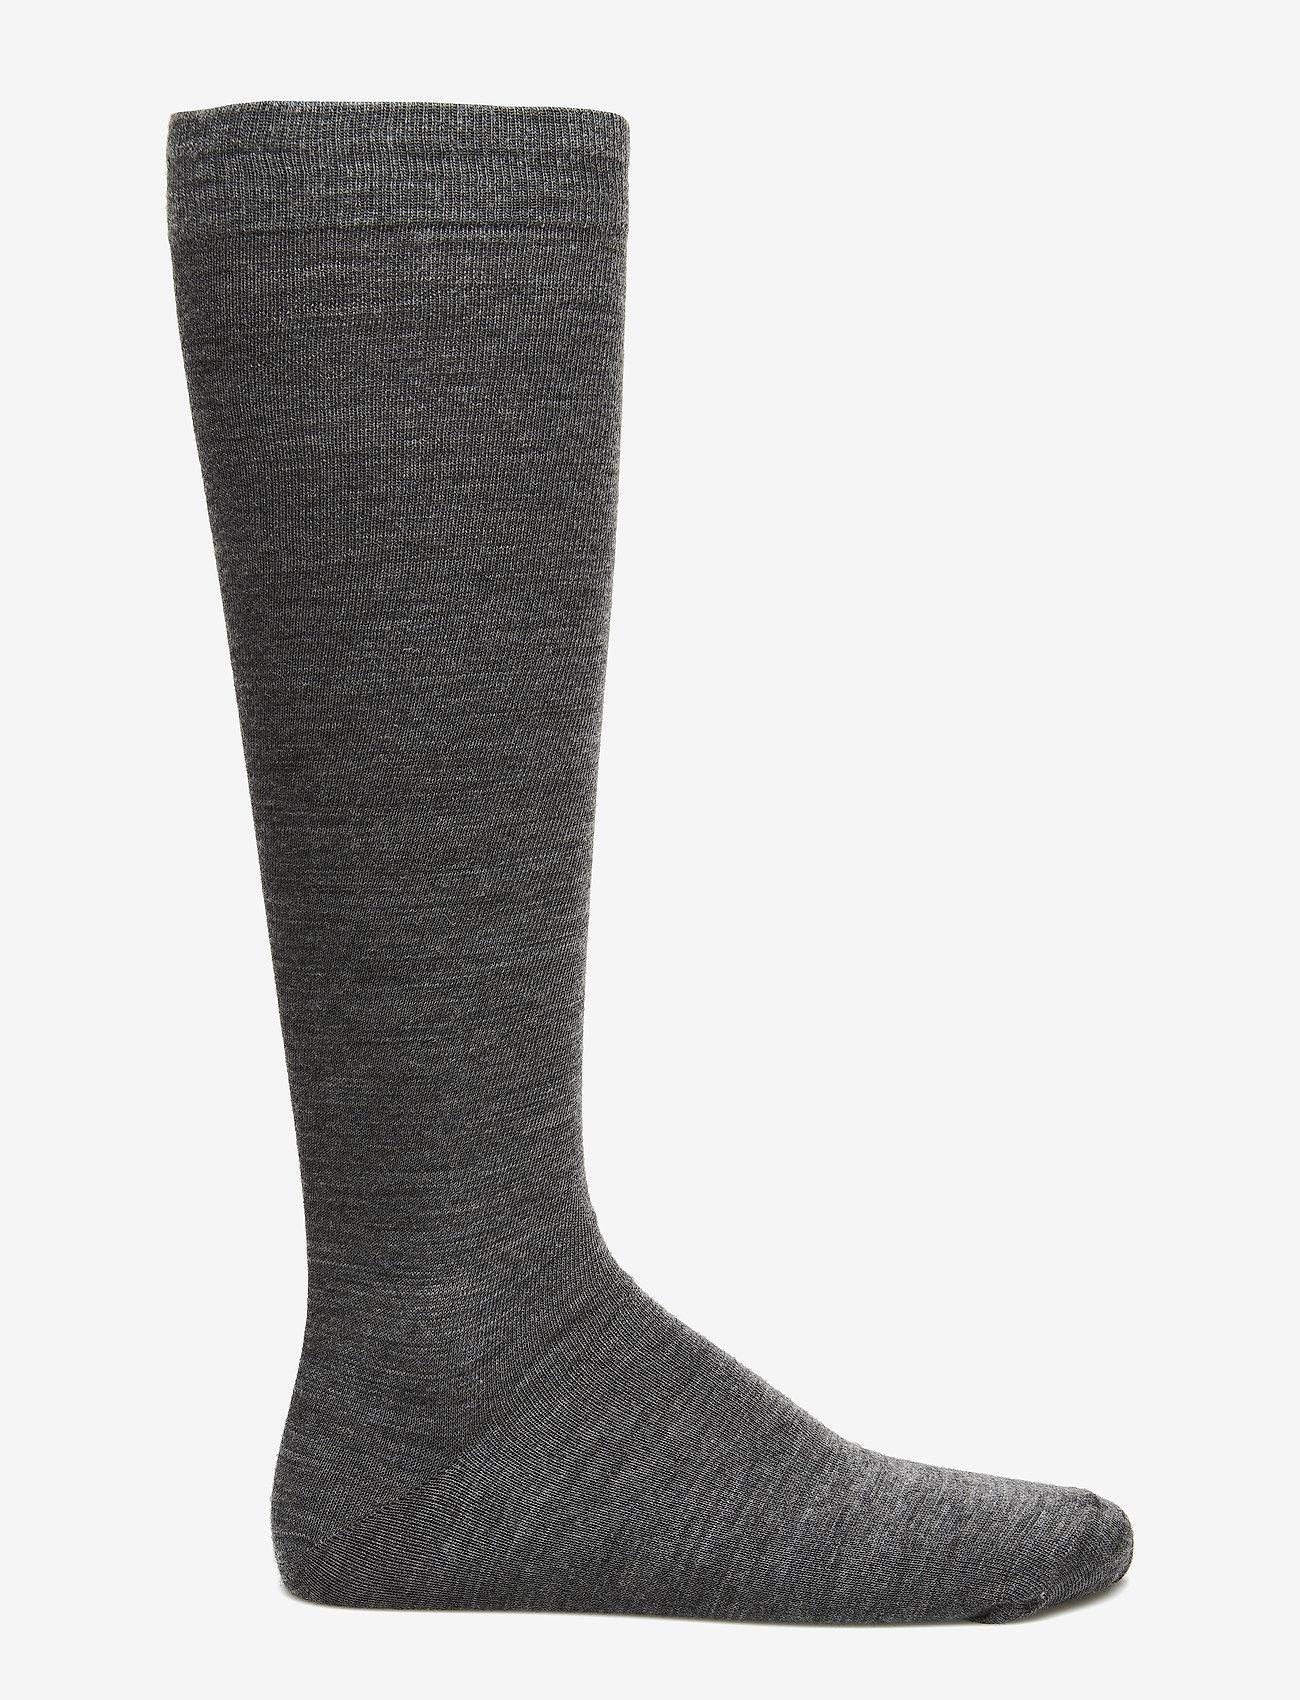 Egtved - Egtved socks twin kneehigh , - regular socks - grey mel.